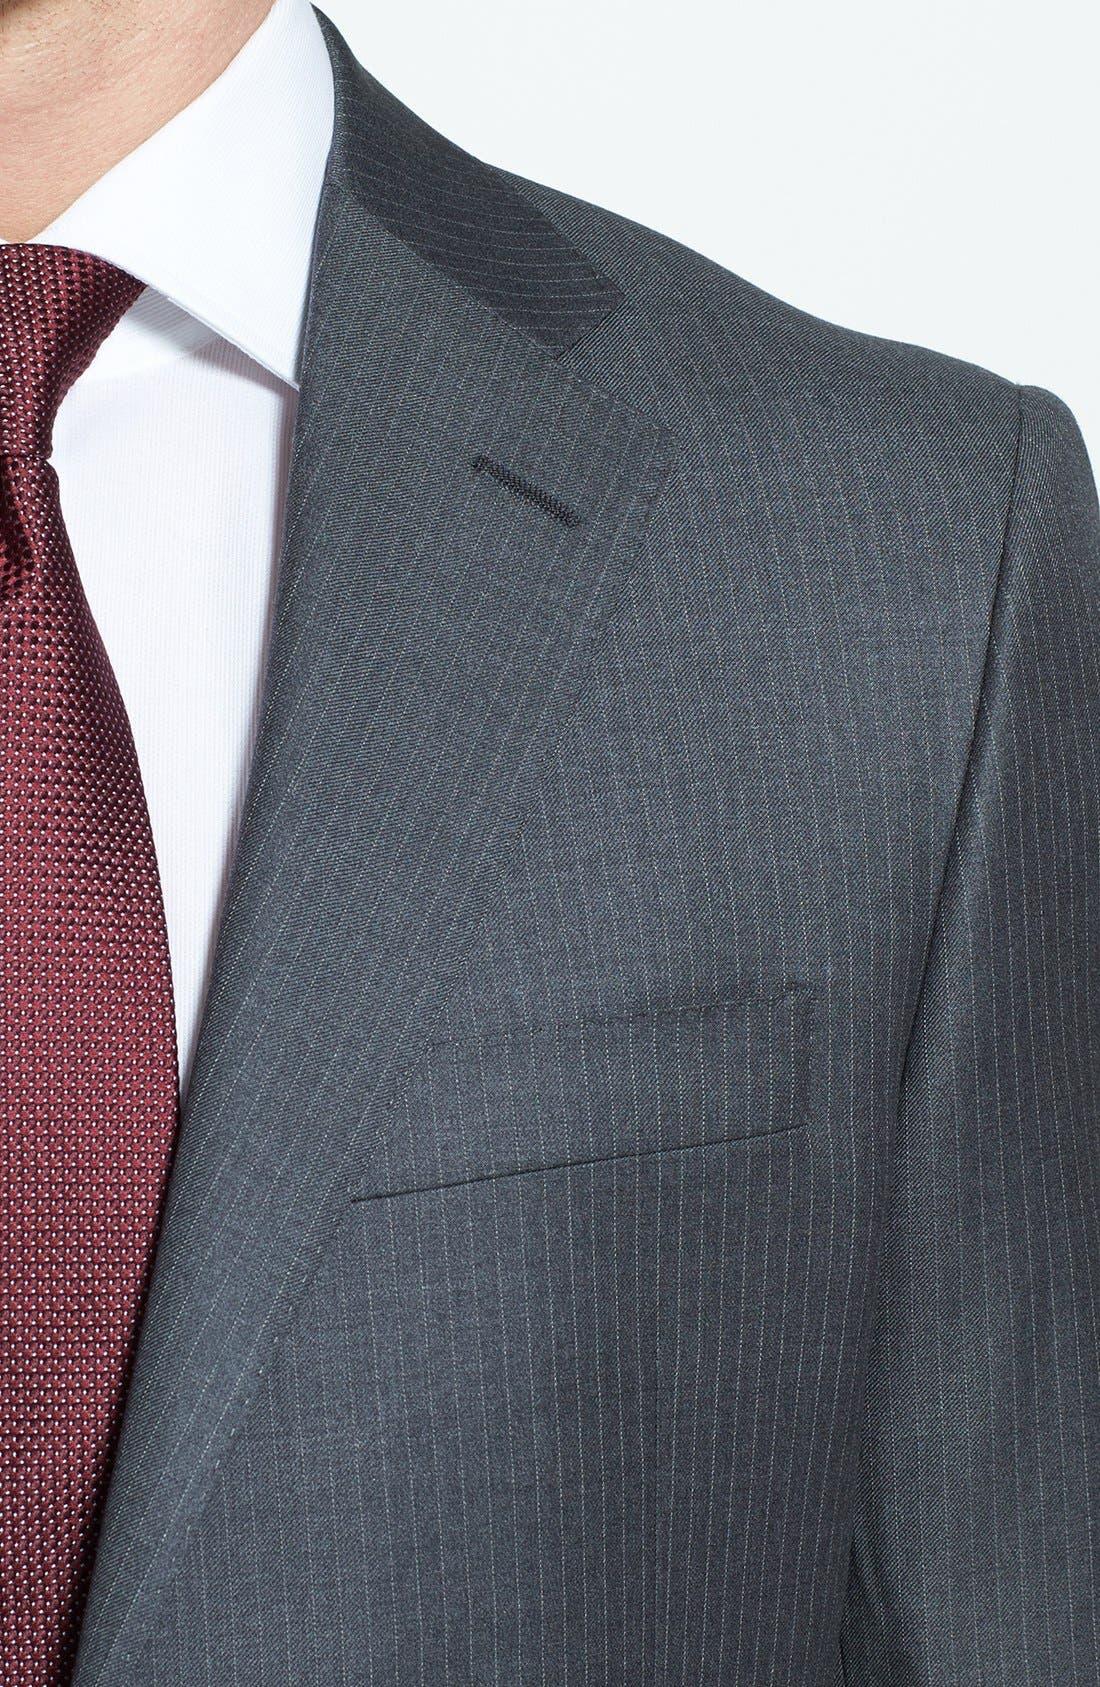 Alternate Image 2  - Hickey Freeman 'Beacon' Classic Fit Stripe Suit